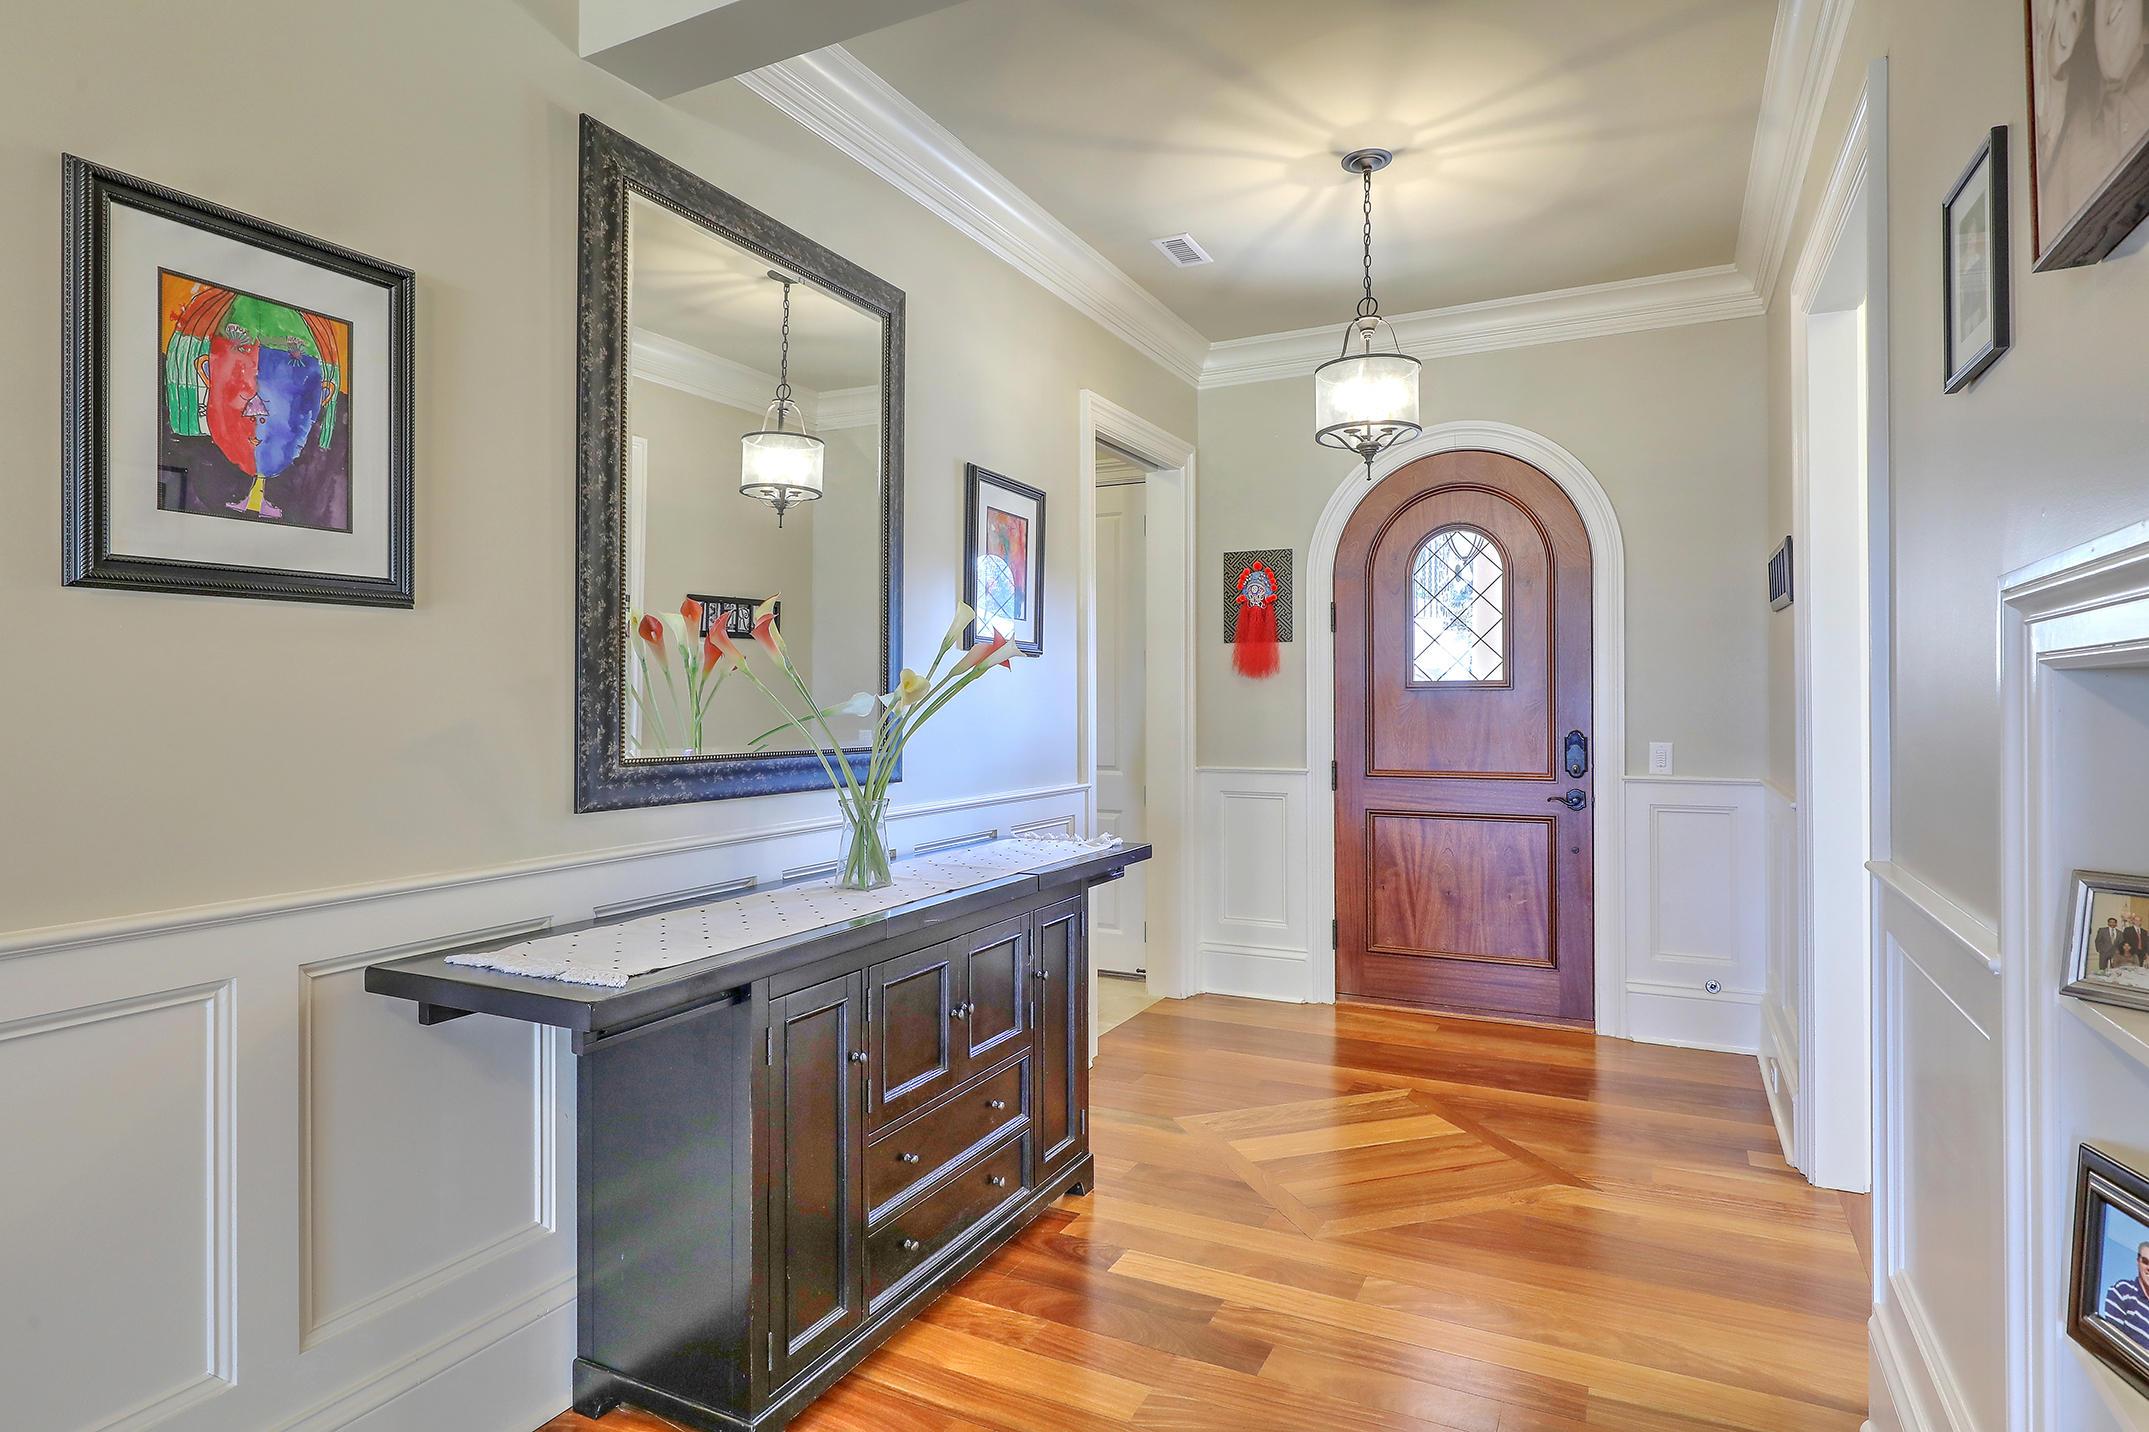 Wappoo Hall Homes For Sale - 2044 Wappoo Hall, Charleston, SC - 53